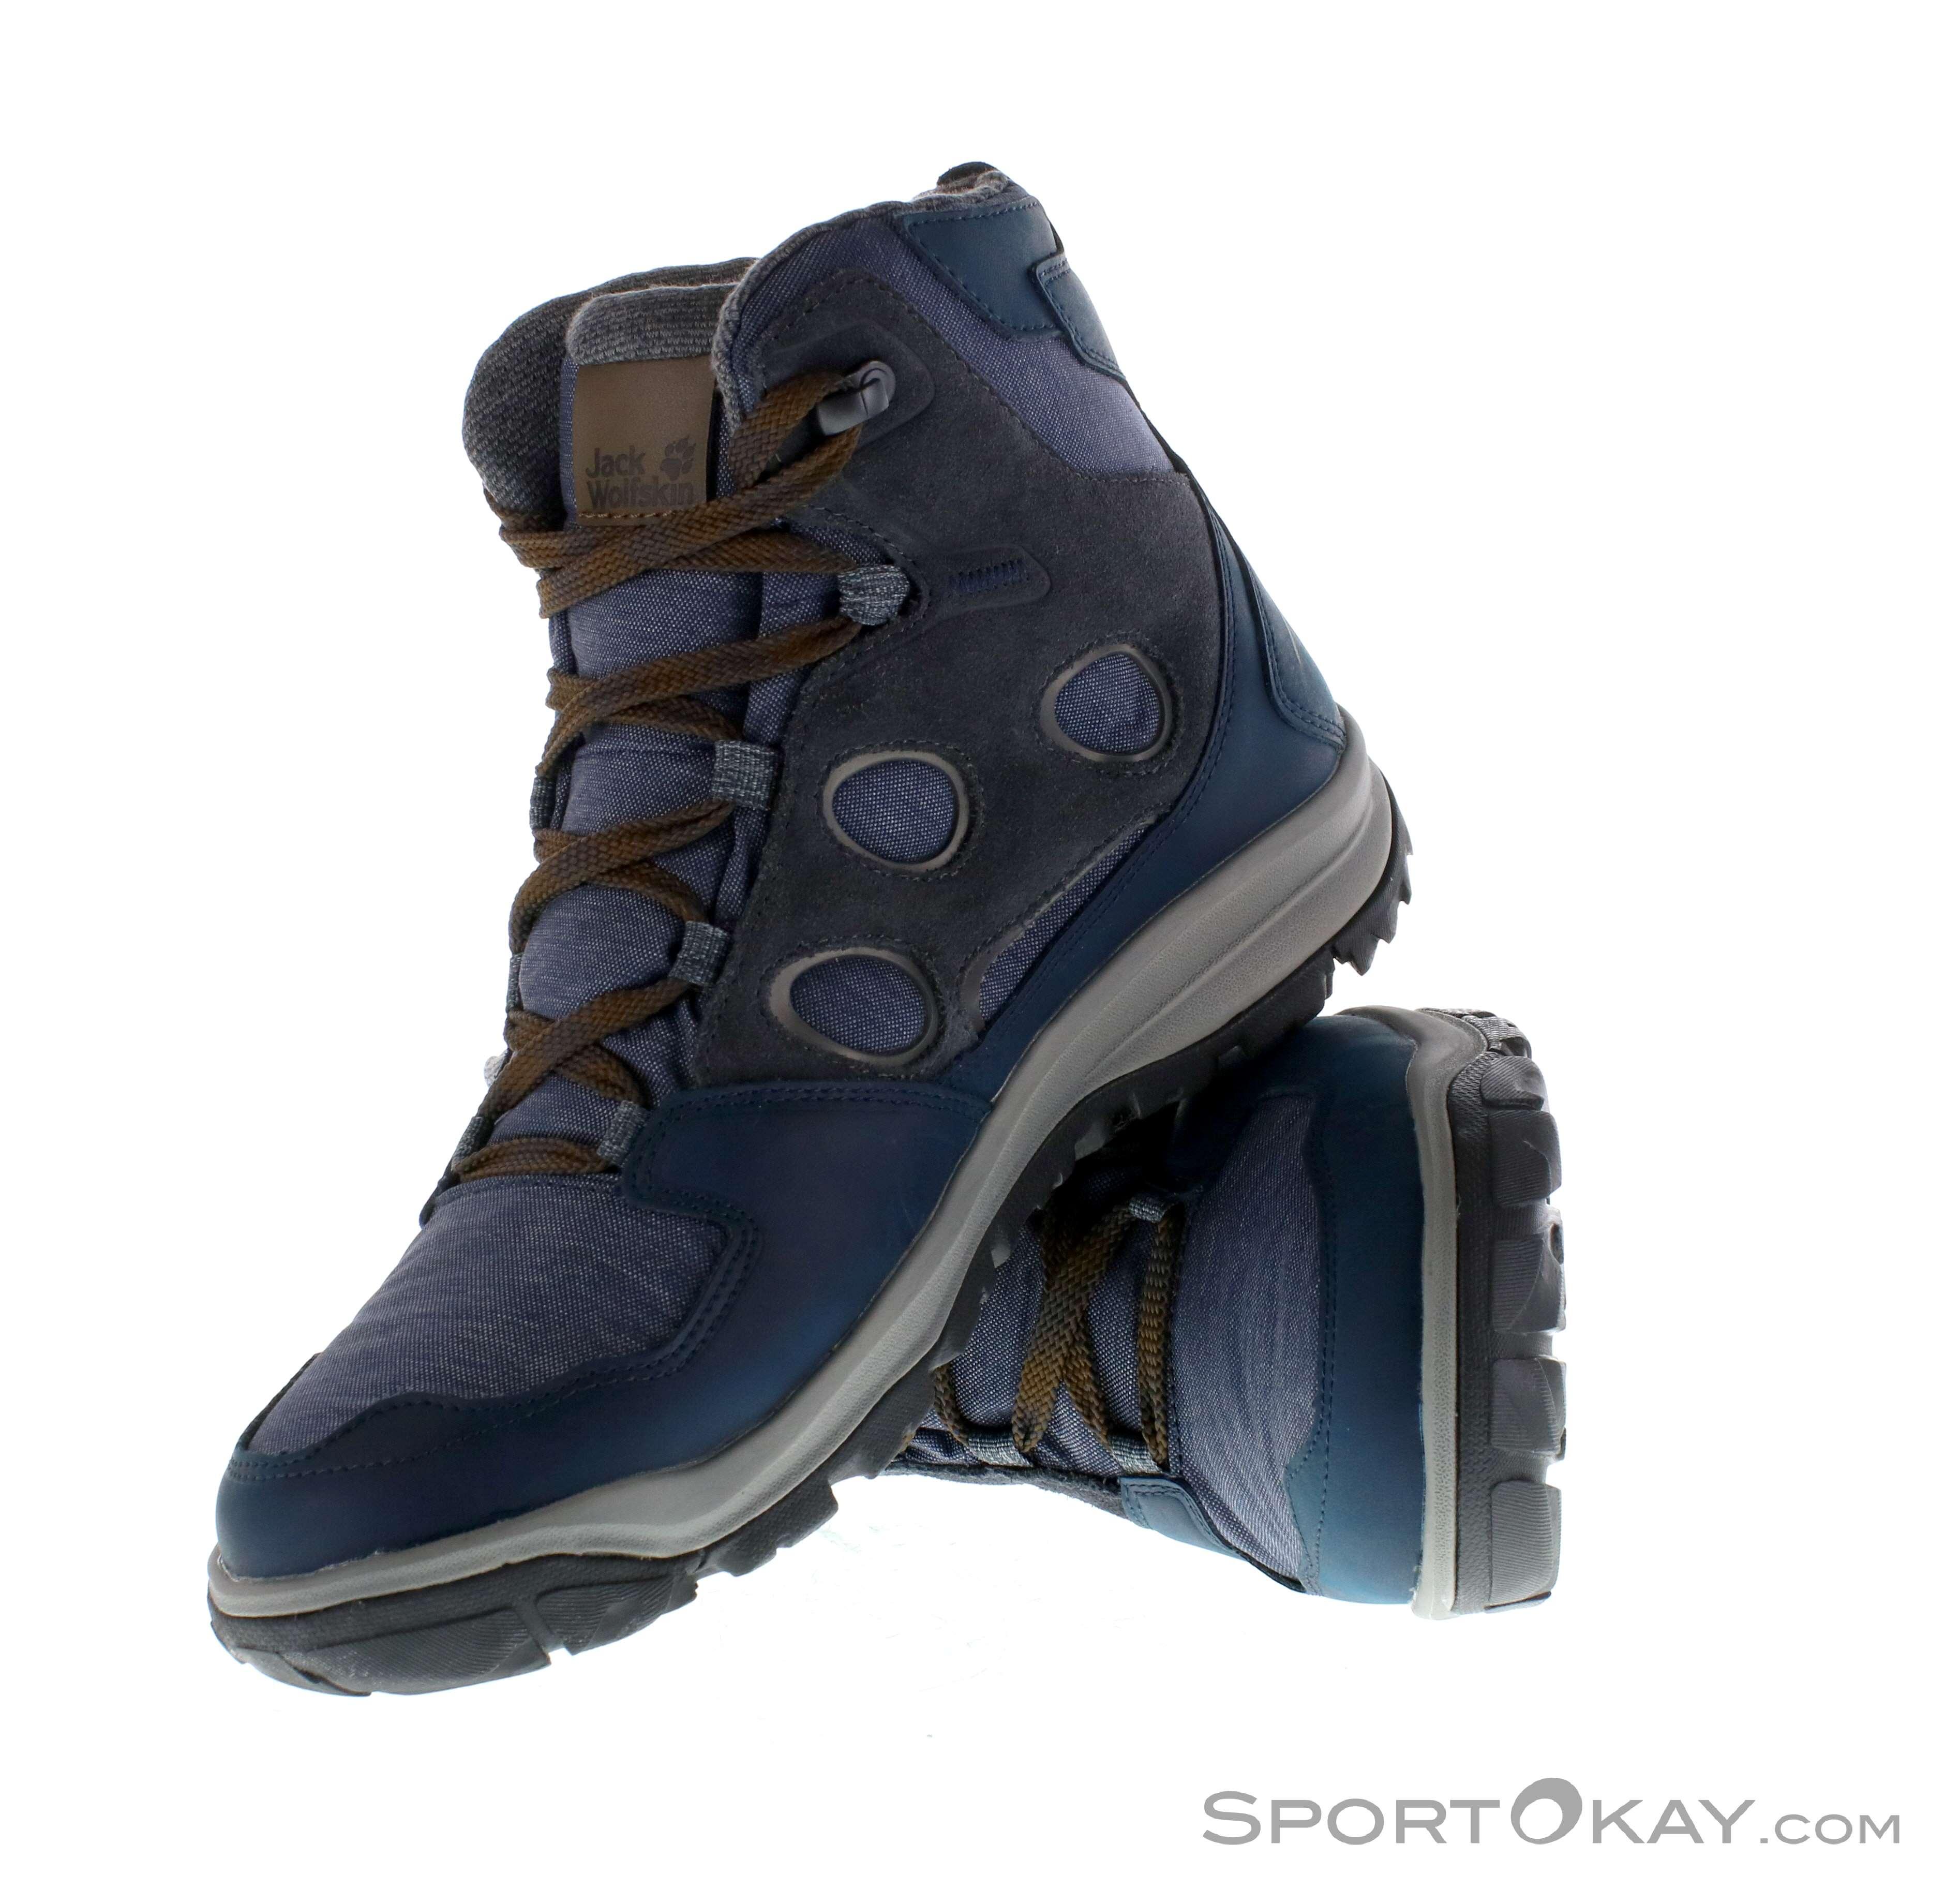 aaaadaa0 Jack Wolfskin Vancouver Texapore Mid Mens Hiking Boots, Jack Wolfskin,  Blue, , Male